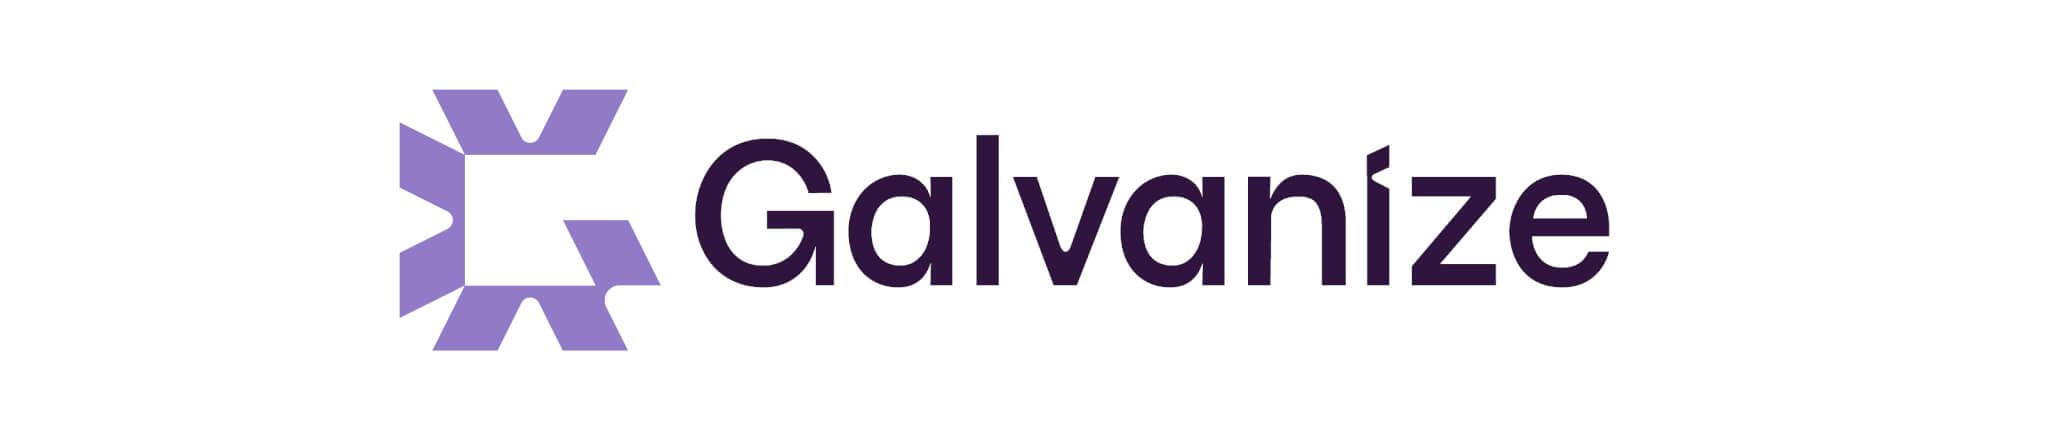 Galvanize logo-2